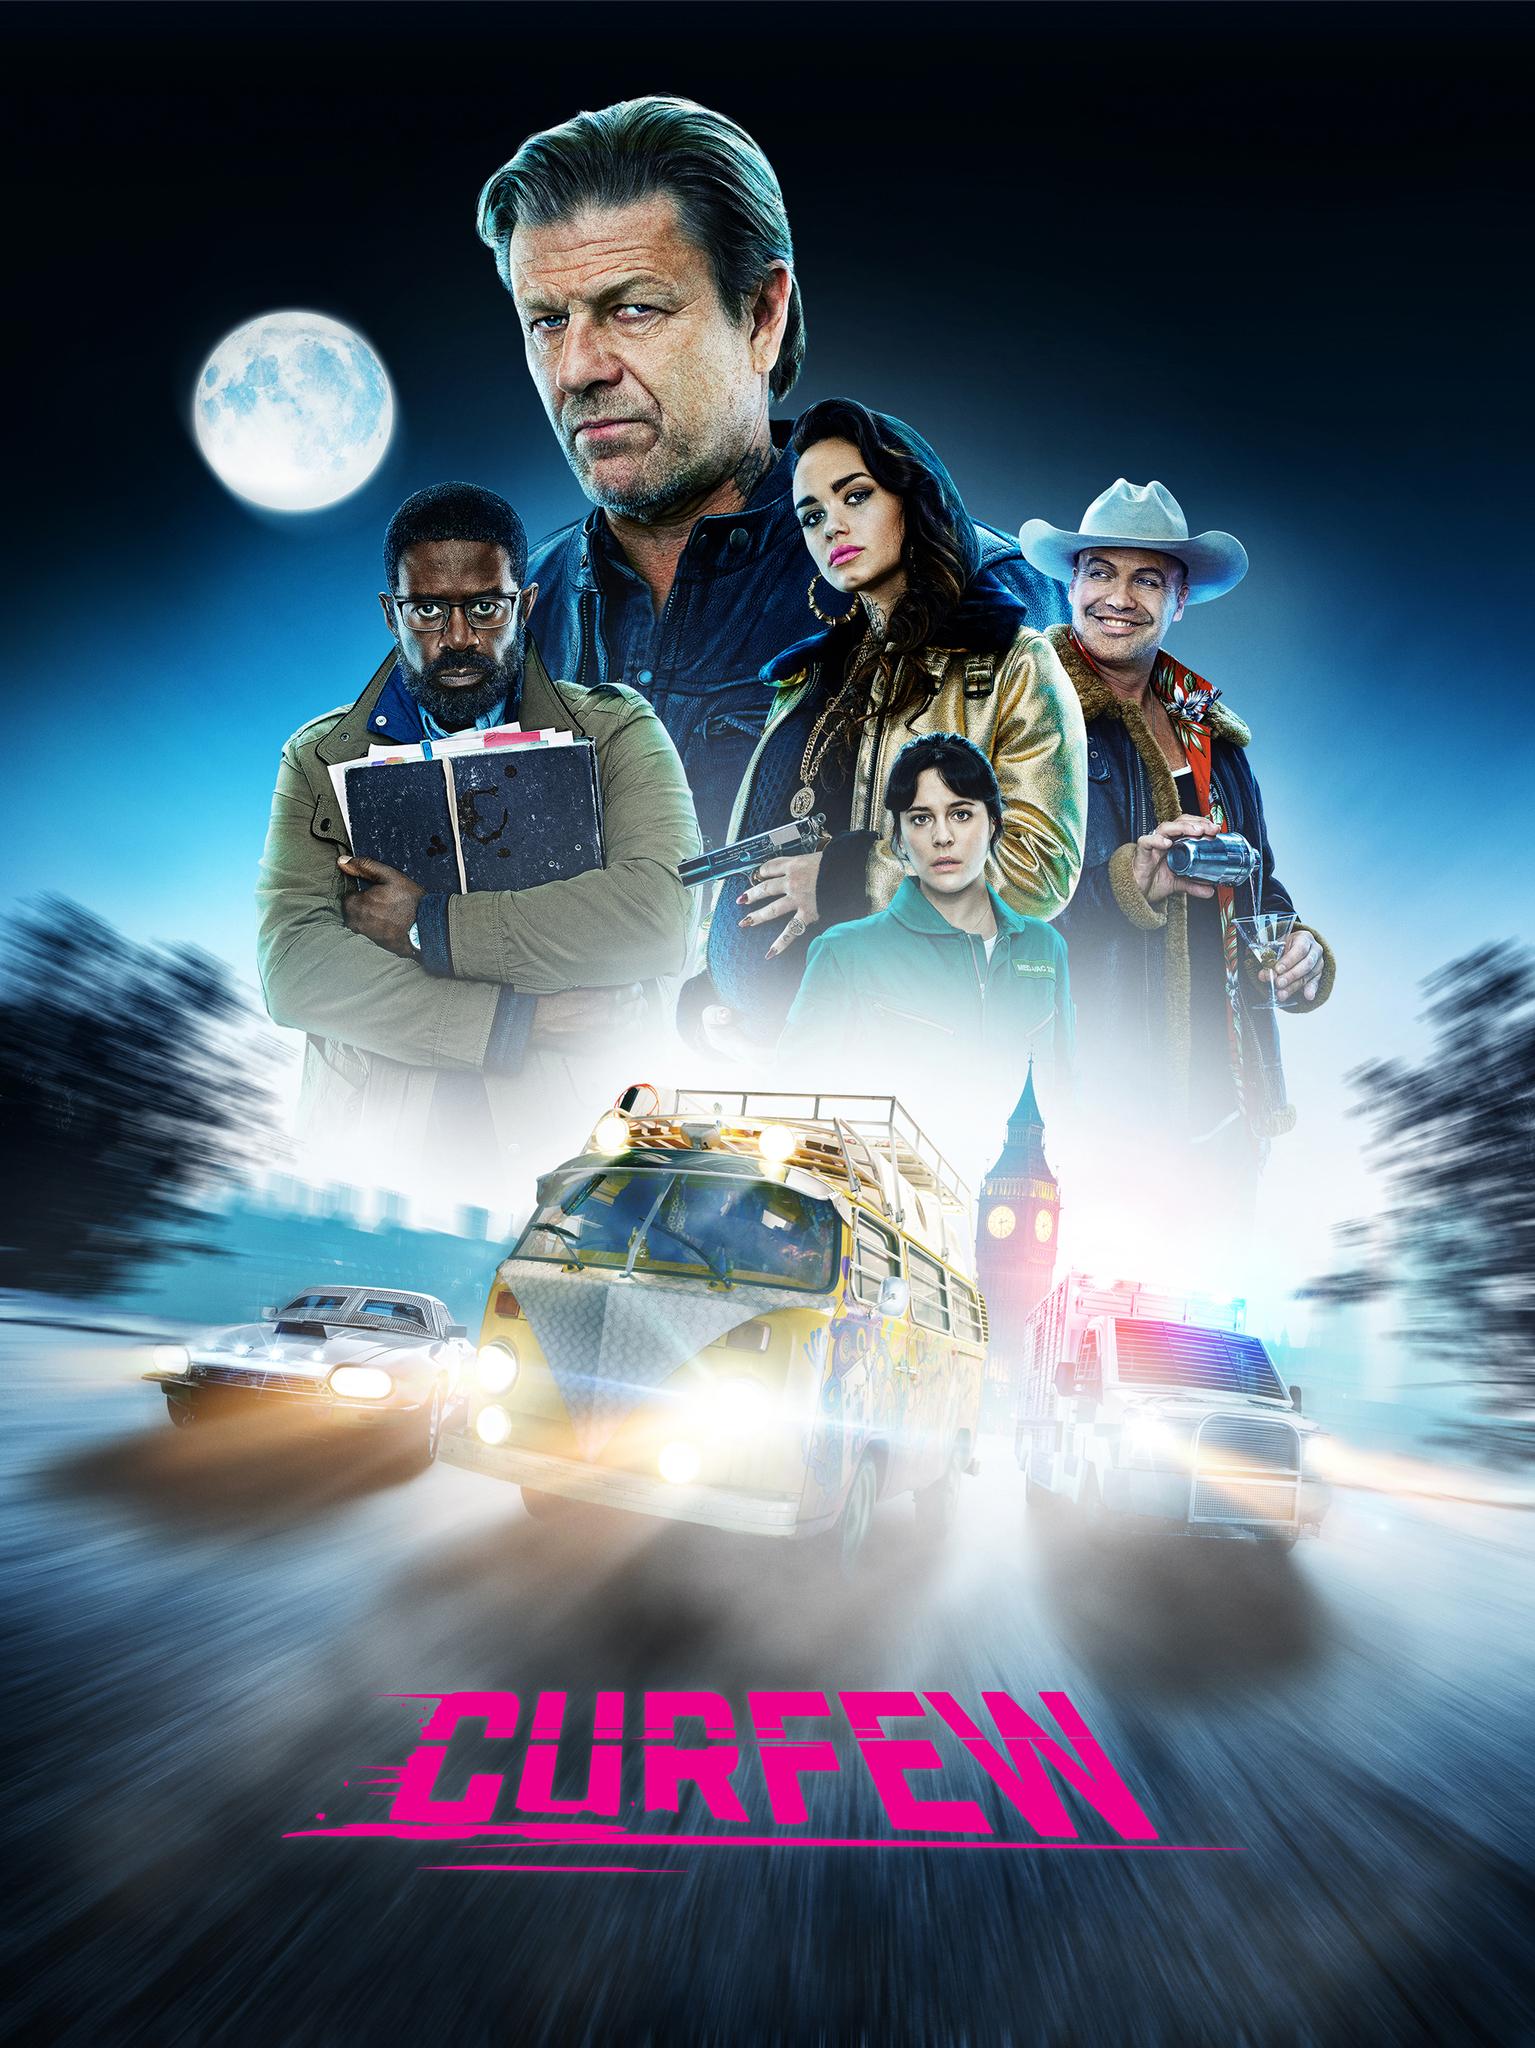 Curfew (TV Series 2019– ) - IMDb